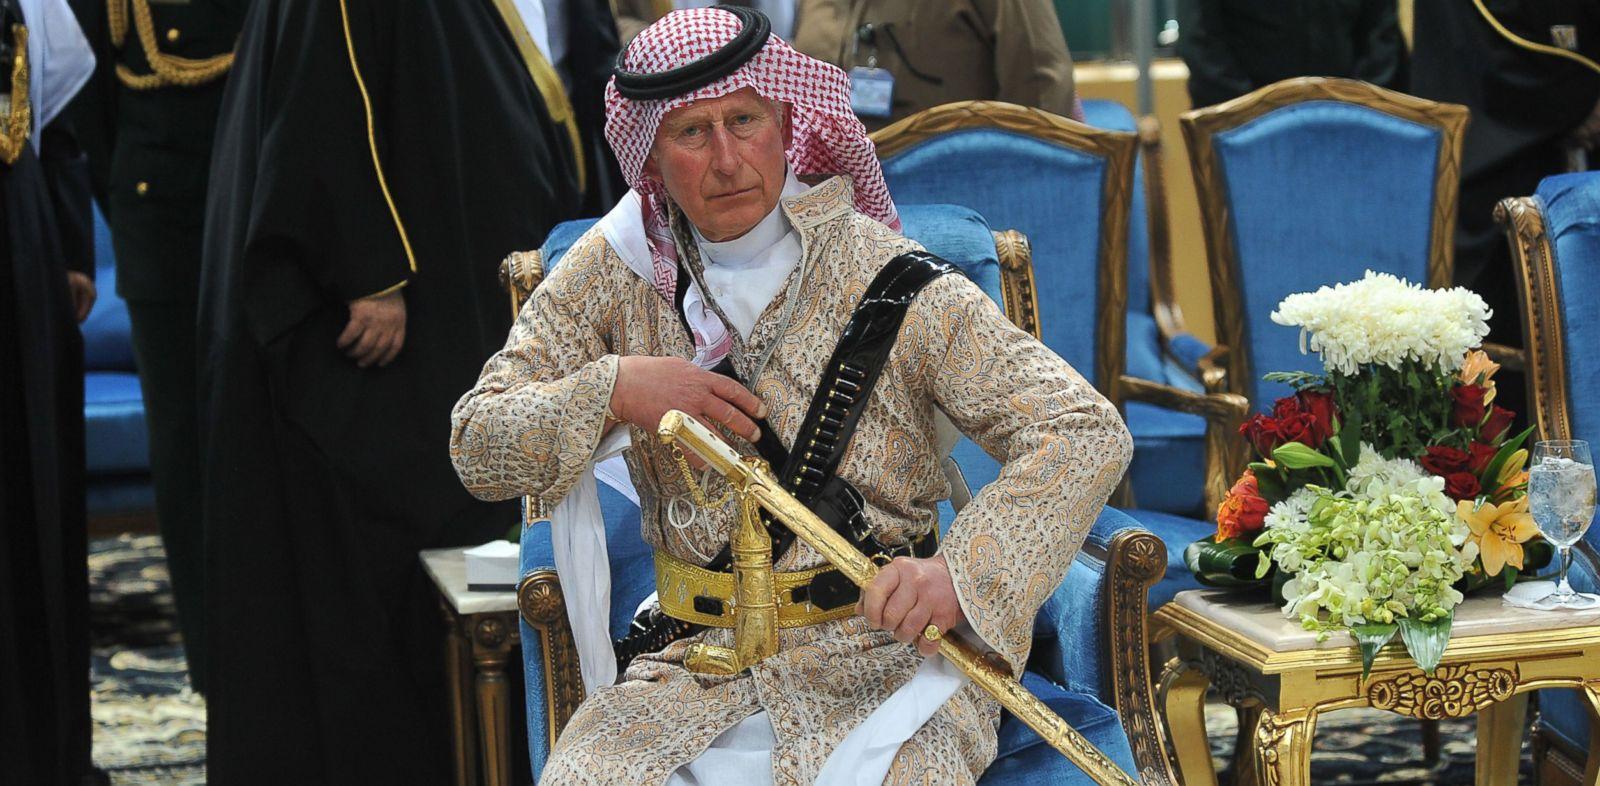 PHOTO: Prince Charles wears traditional Saudi uniform as he attends the Arda performance in Riyadh, Saudi Arabia, Feb. 18, 2014.